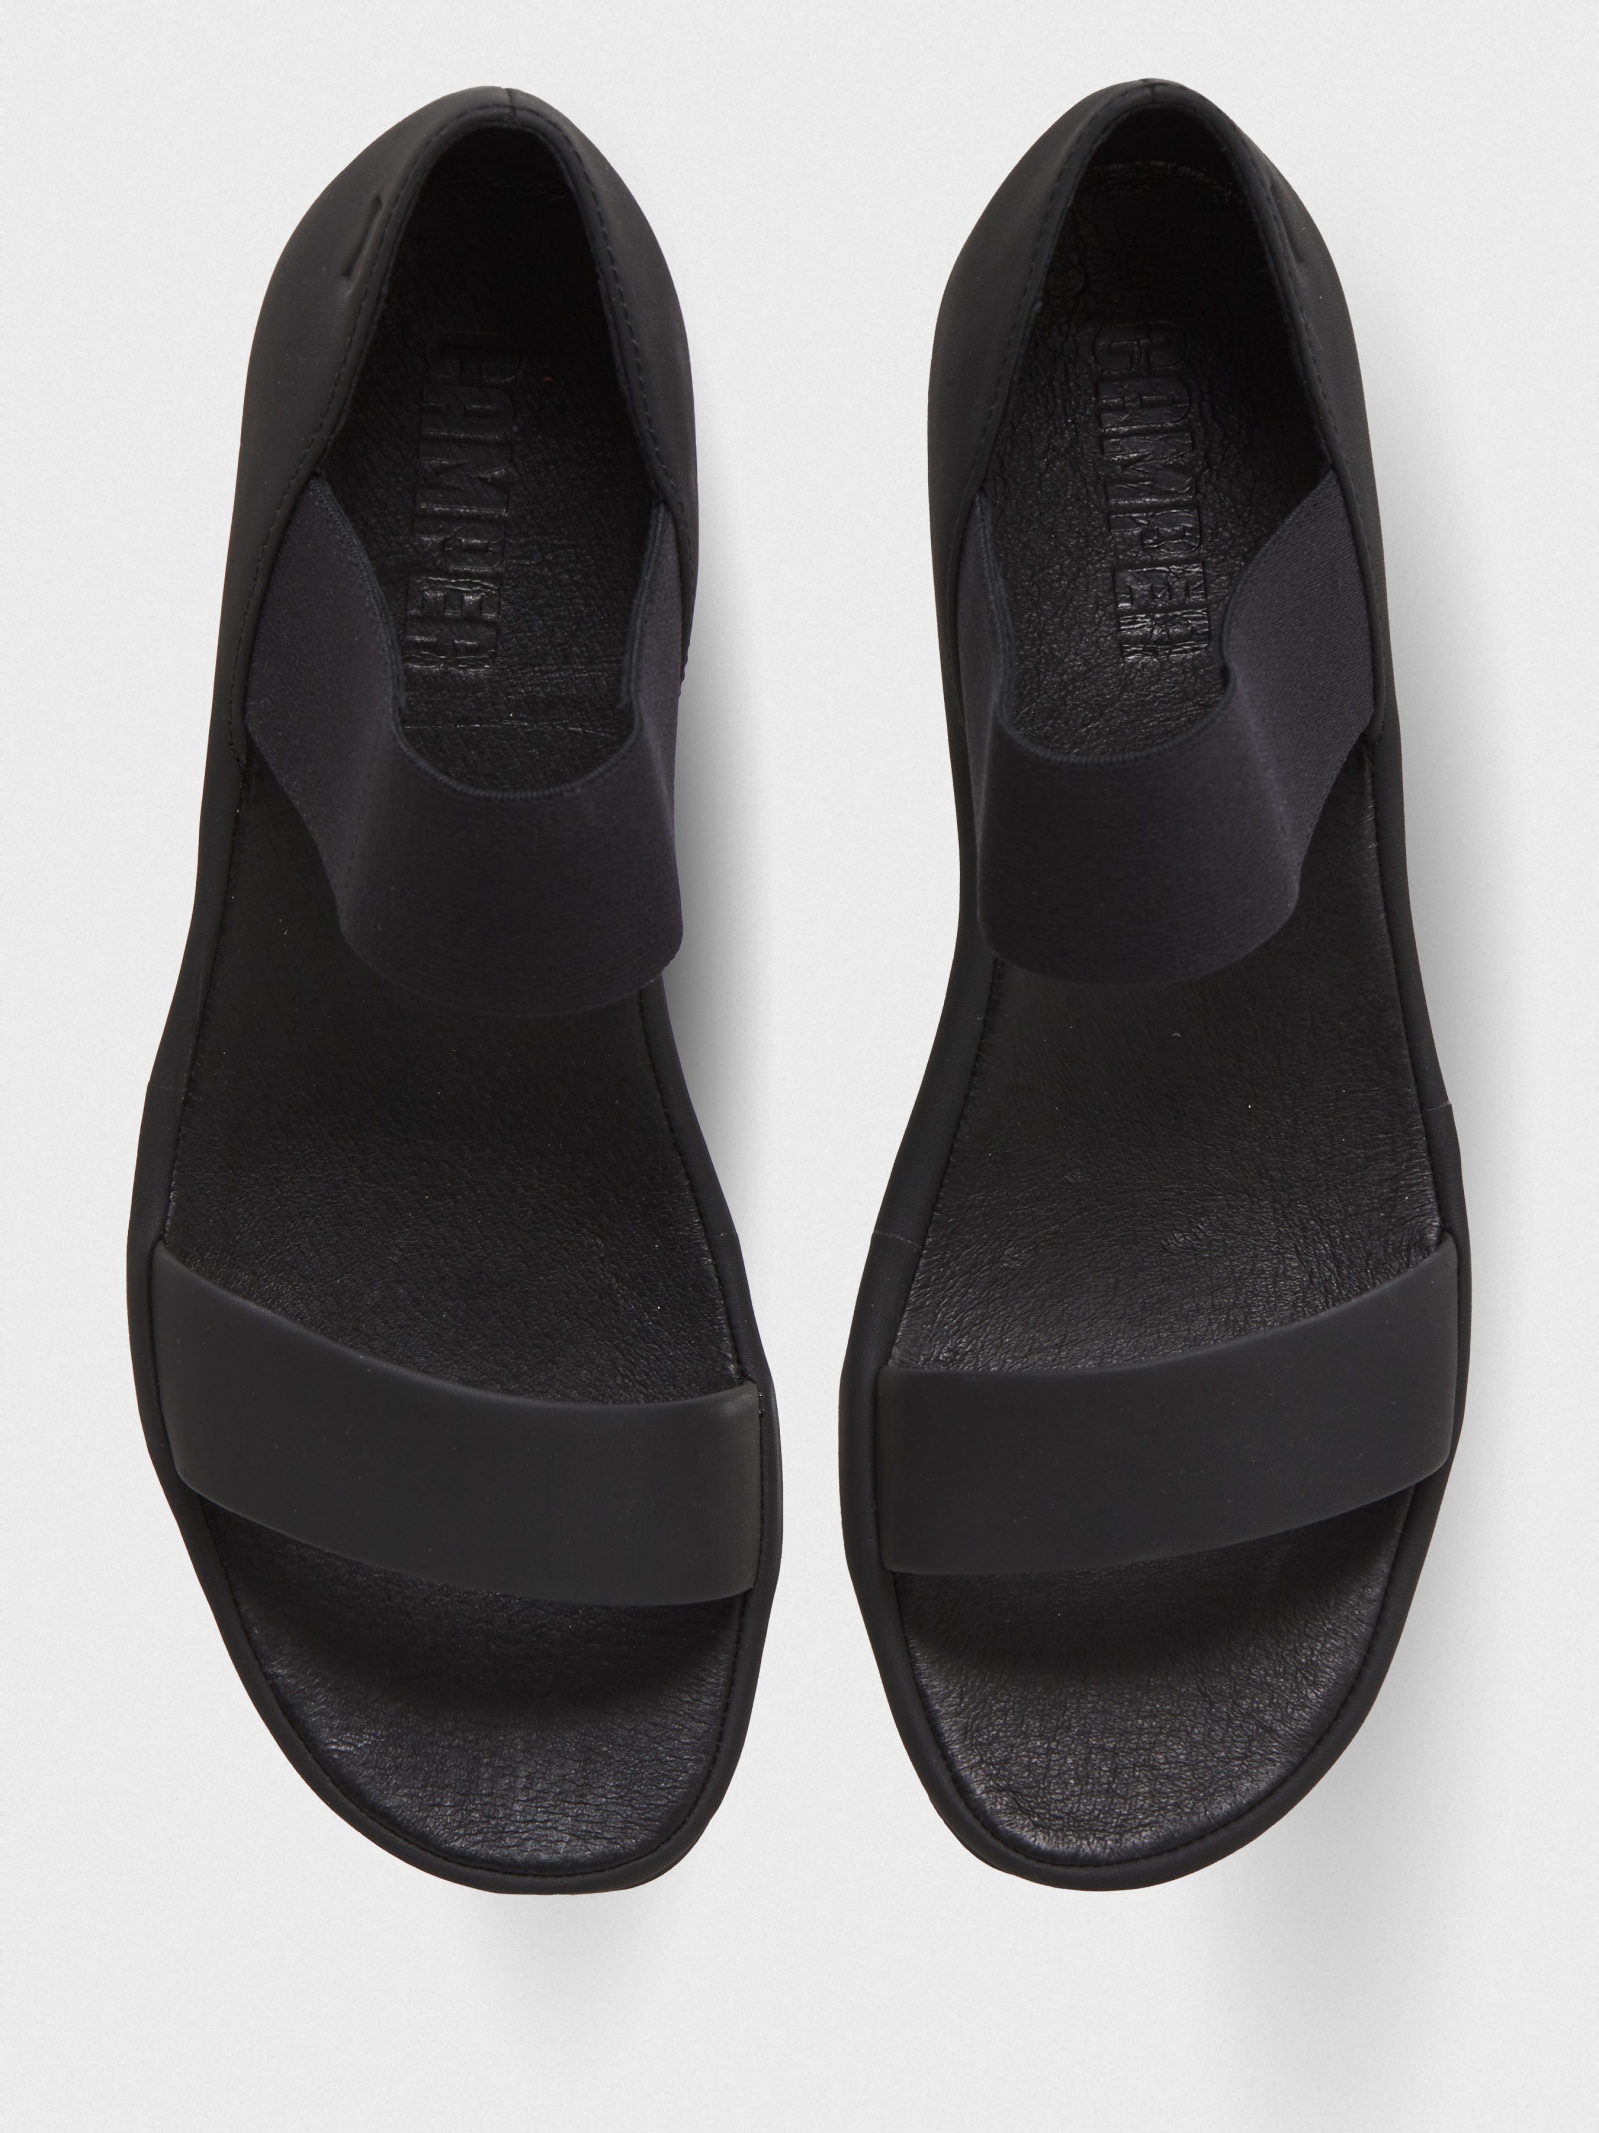 Босоножки для женщин Camper Alright Sandal AW1072 цена обуви, 2017